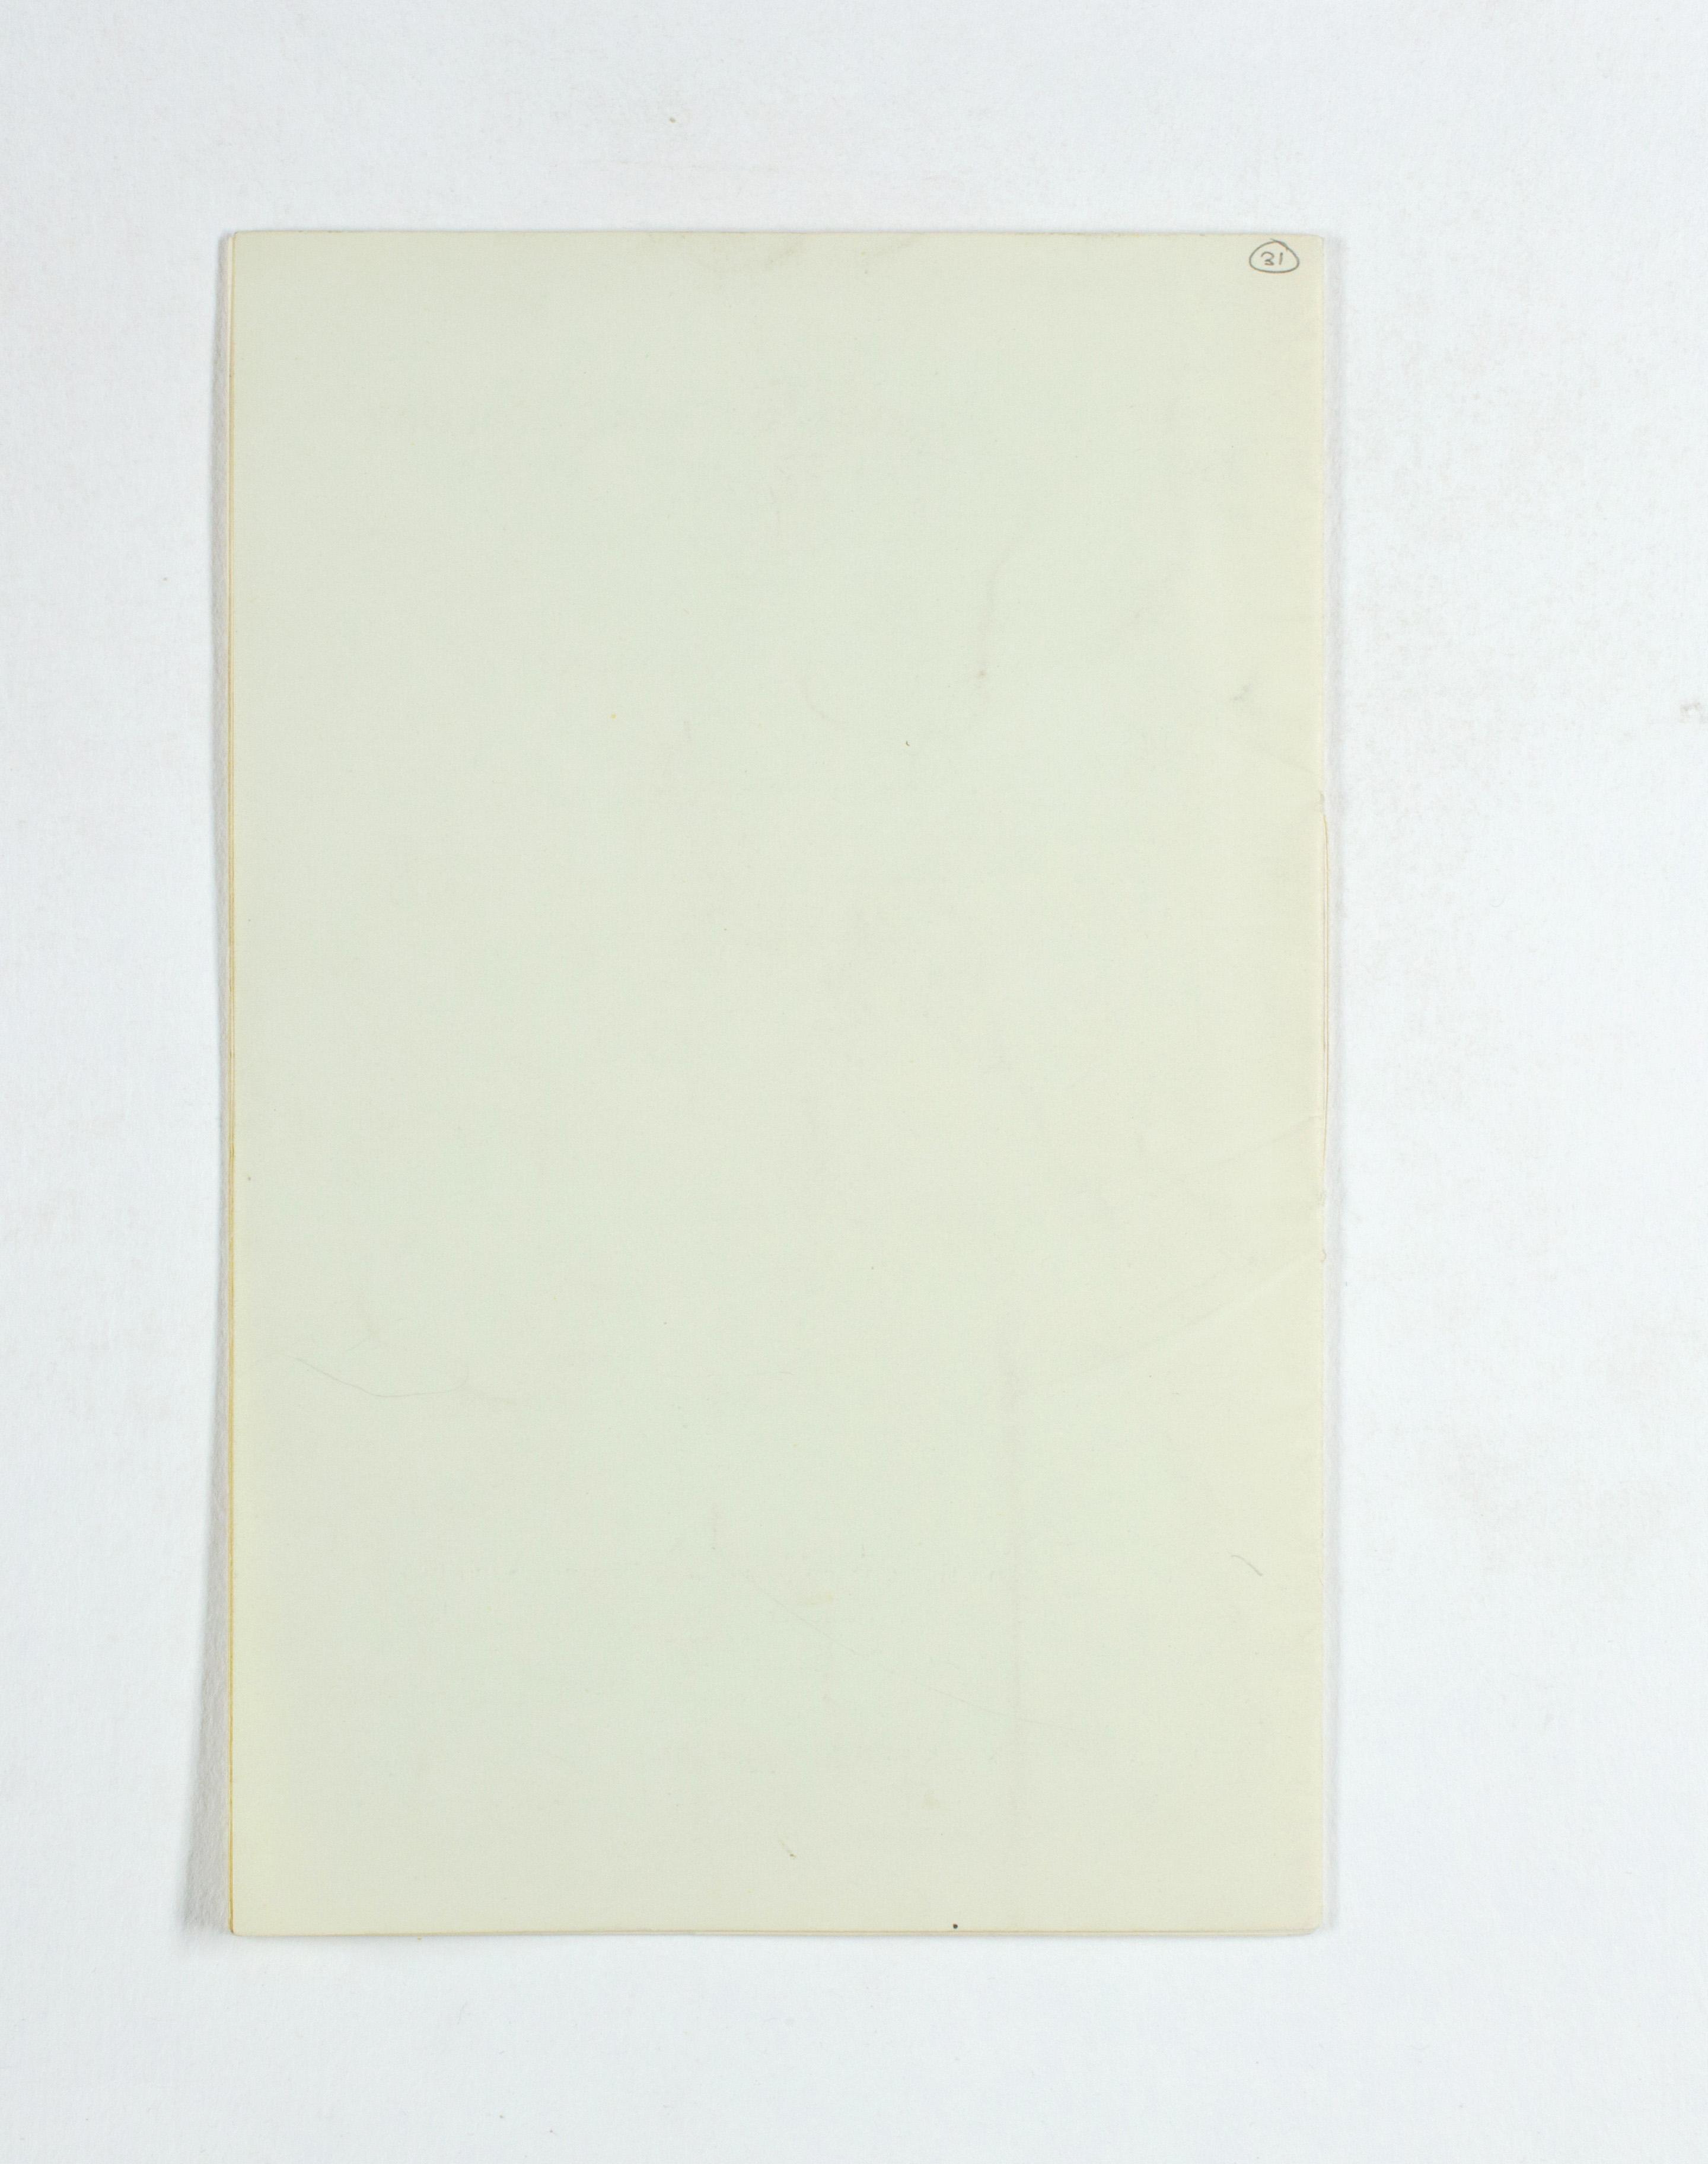 1924-25 Badari, Faiyum Exhibition catalogue PMA/WFP1/D/28/31.9